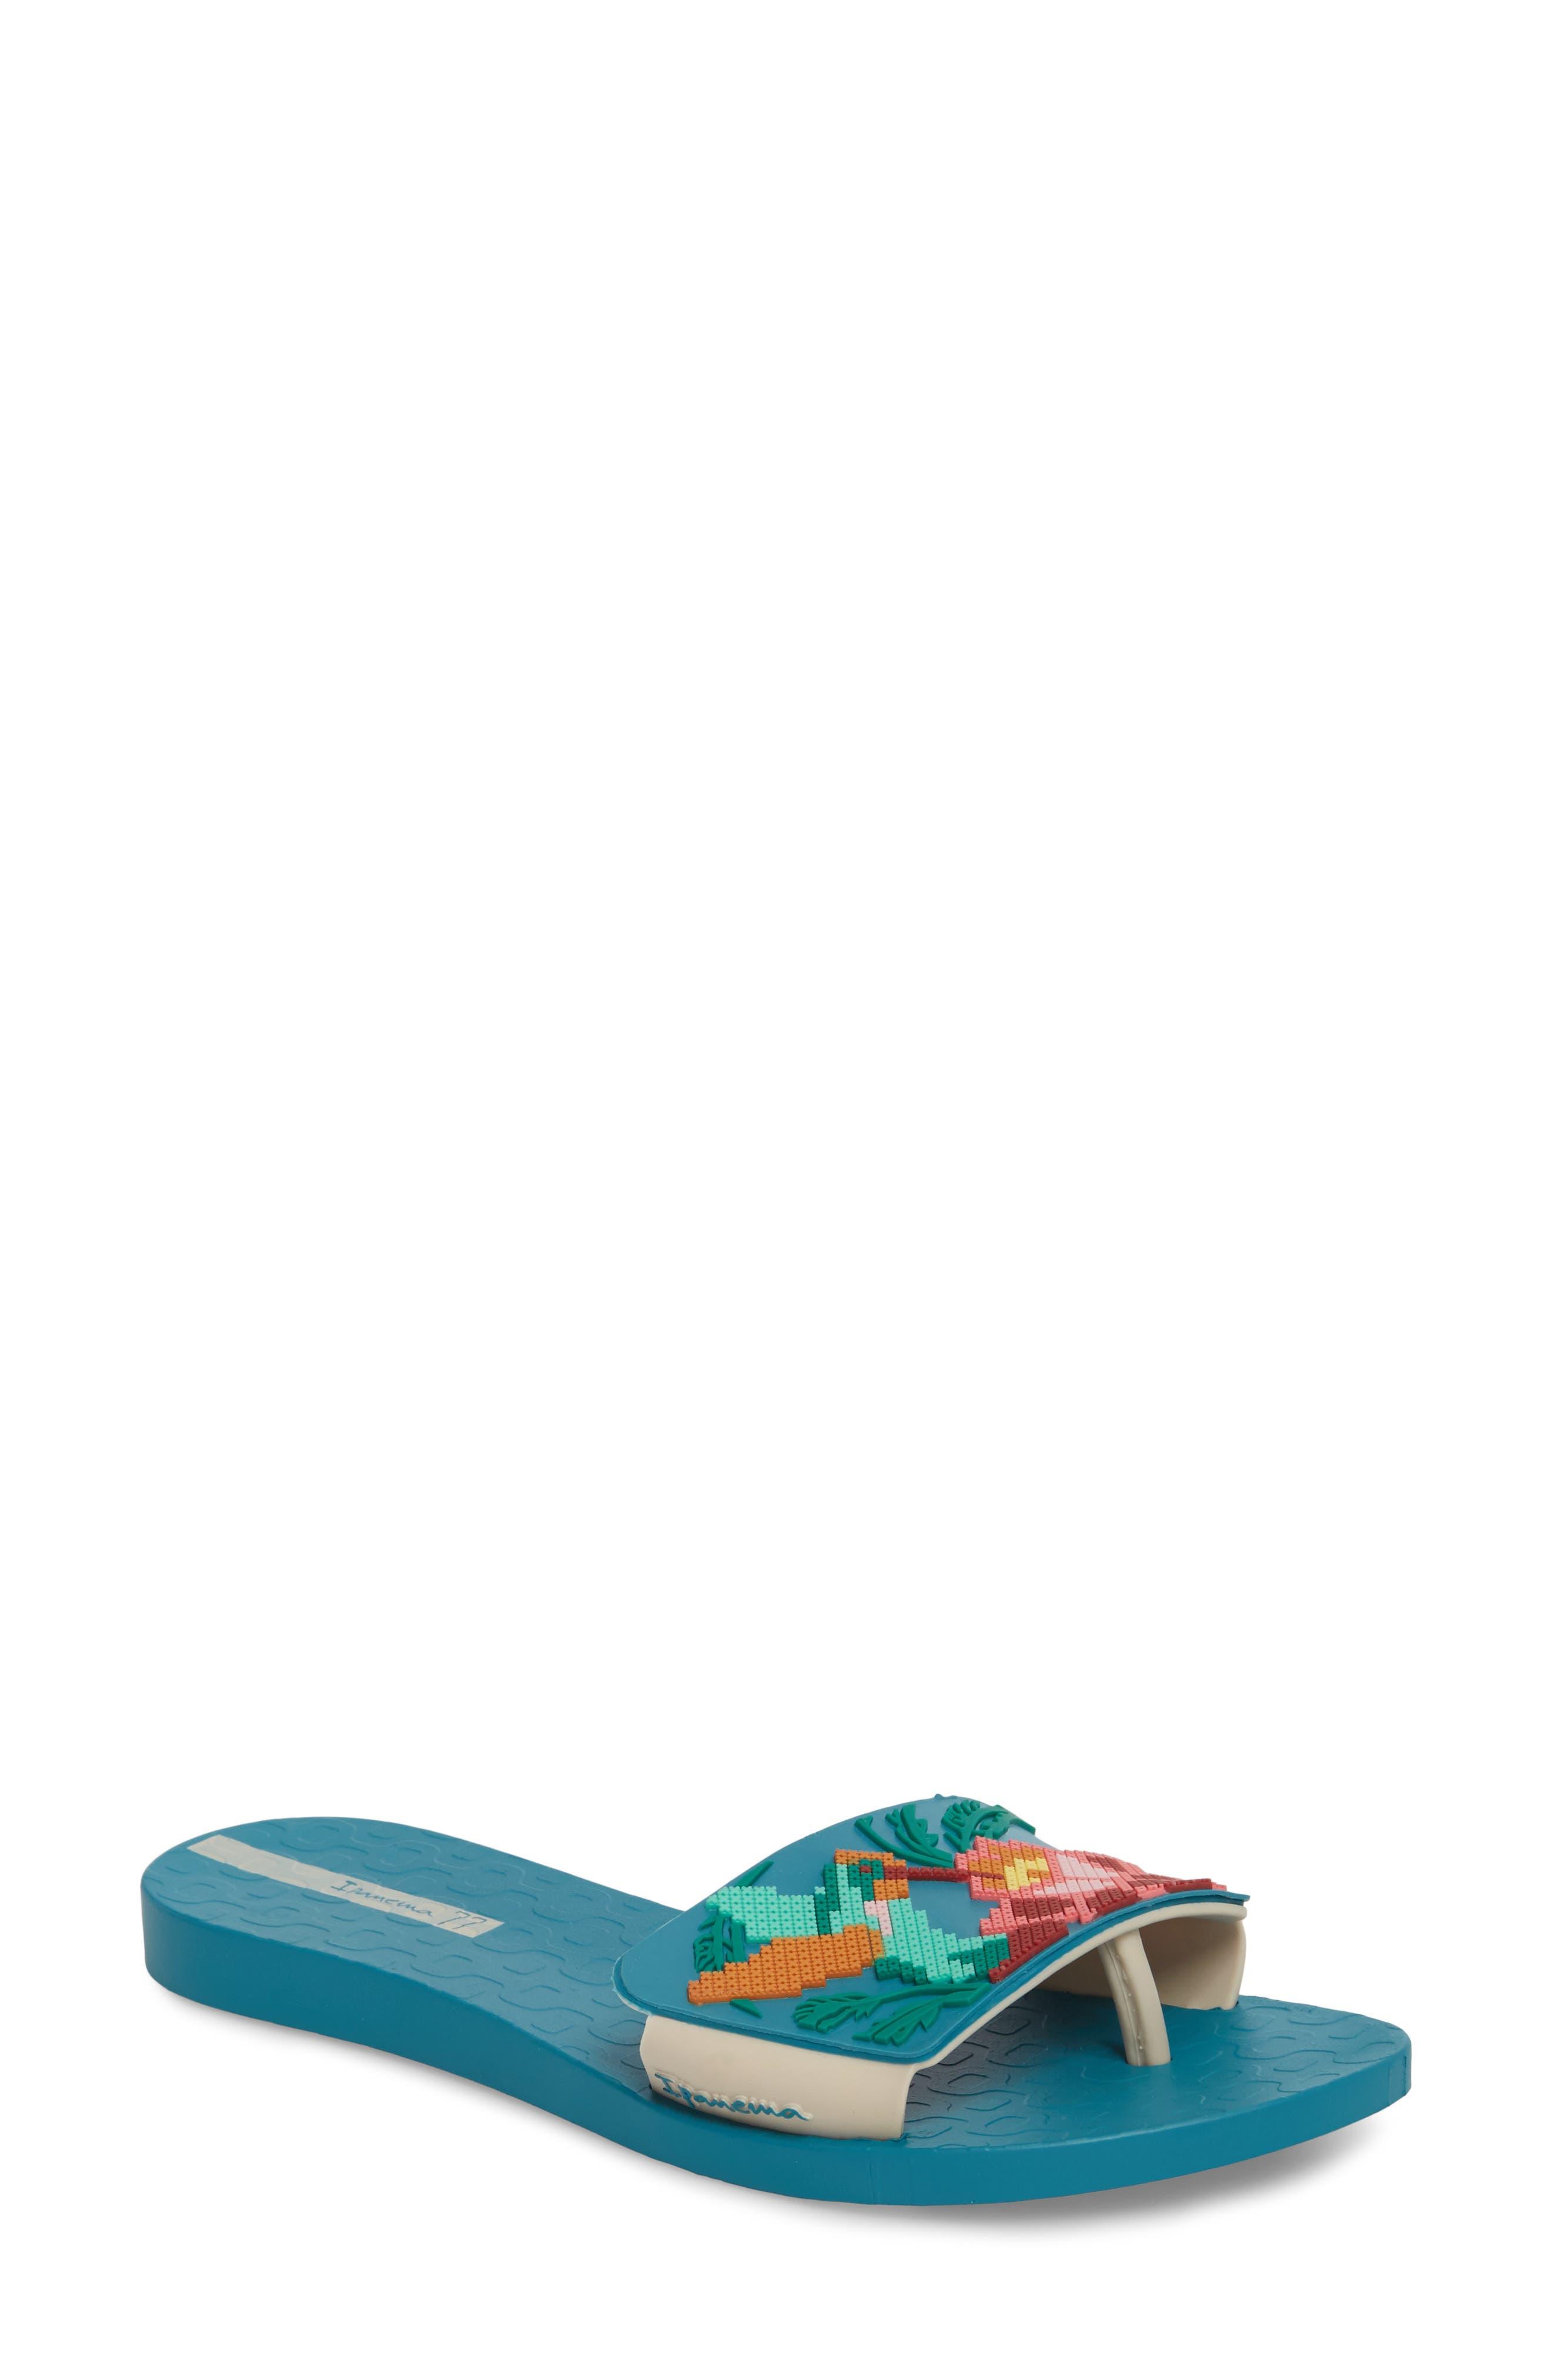 IPANEMA Nectar Floral Slide Sandal in Blue/ Beige